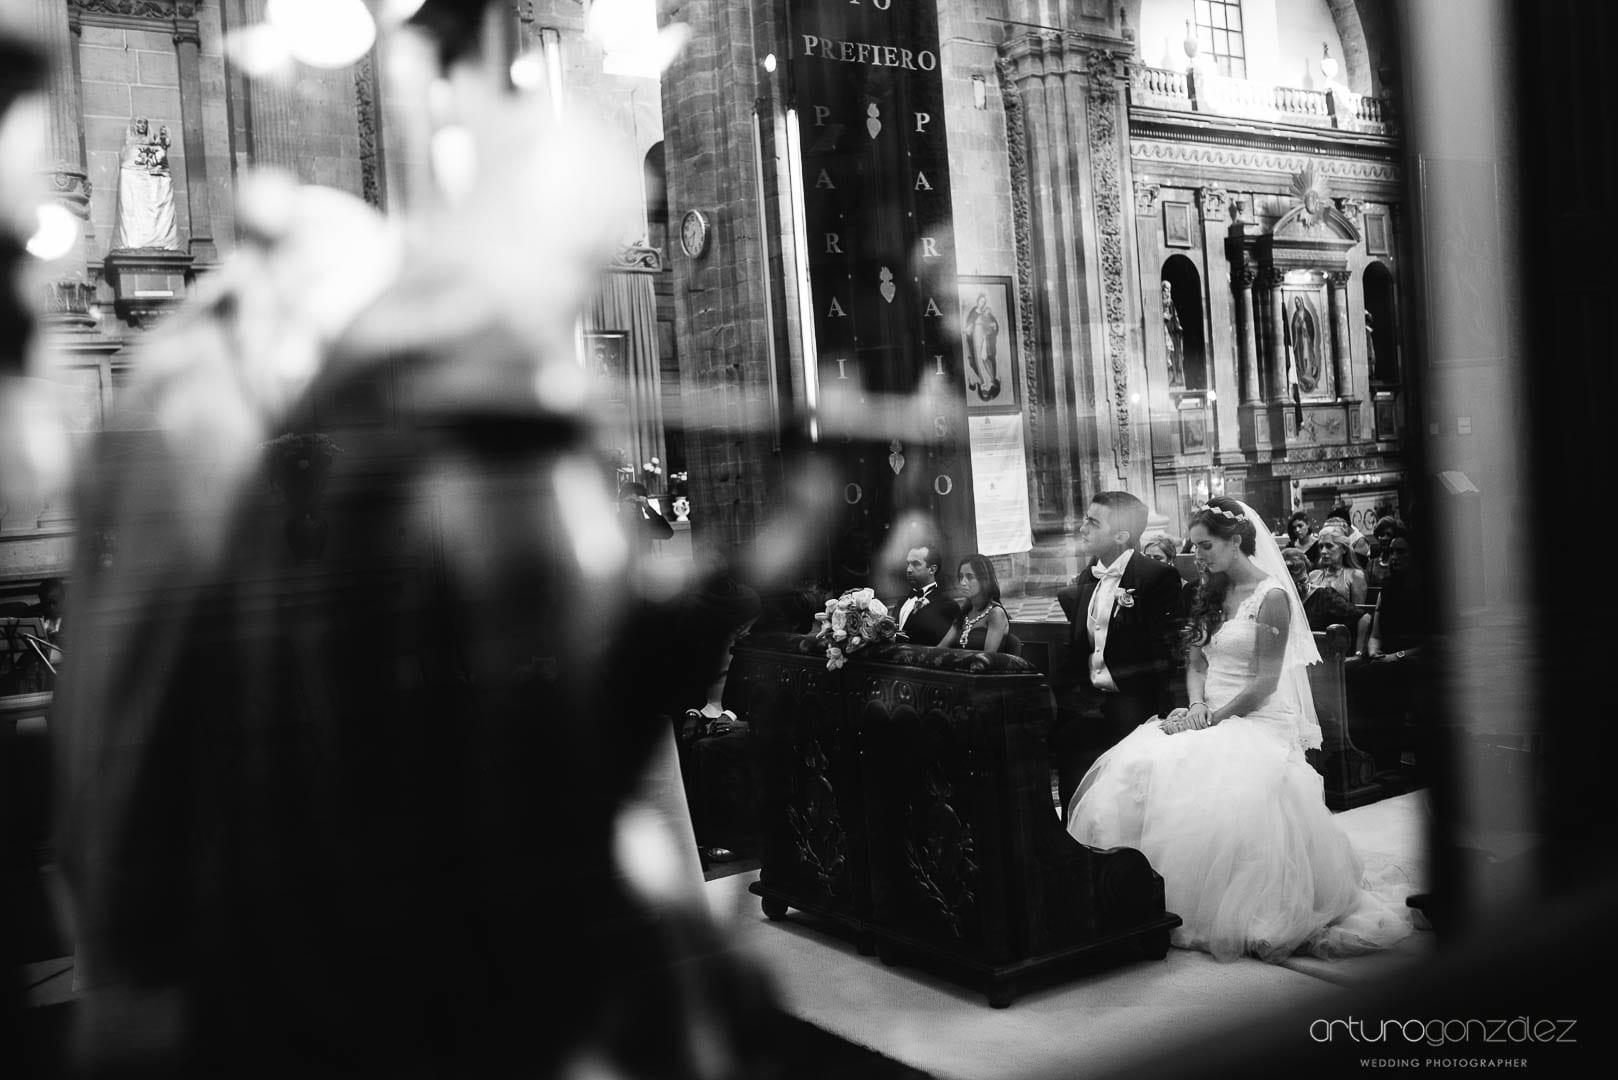 fotografo-de-bodas-en-guanajuato-72